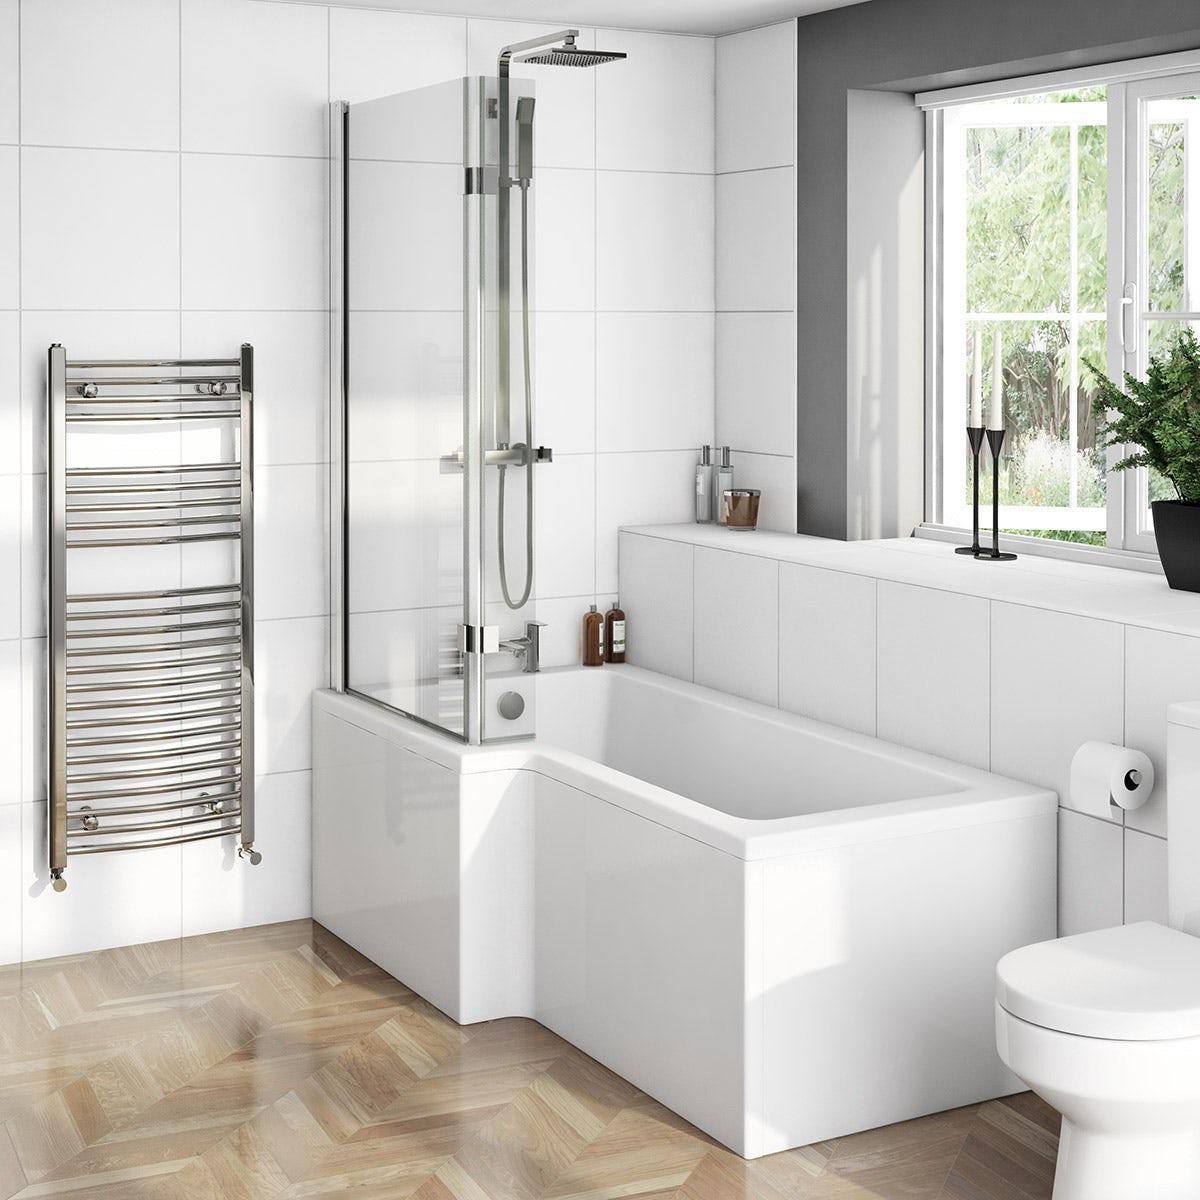 Boston Shower Bath 1700 x 850 LH inc. 8mm Hinged Screen